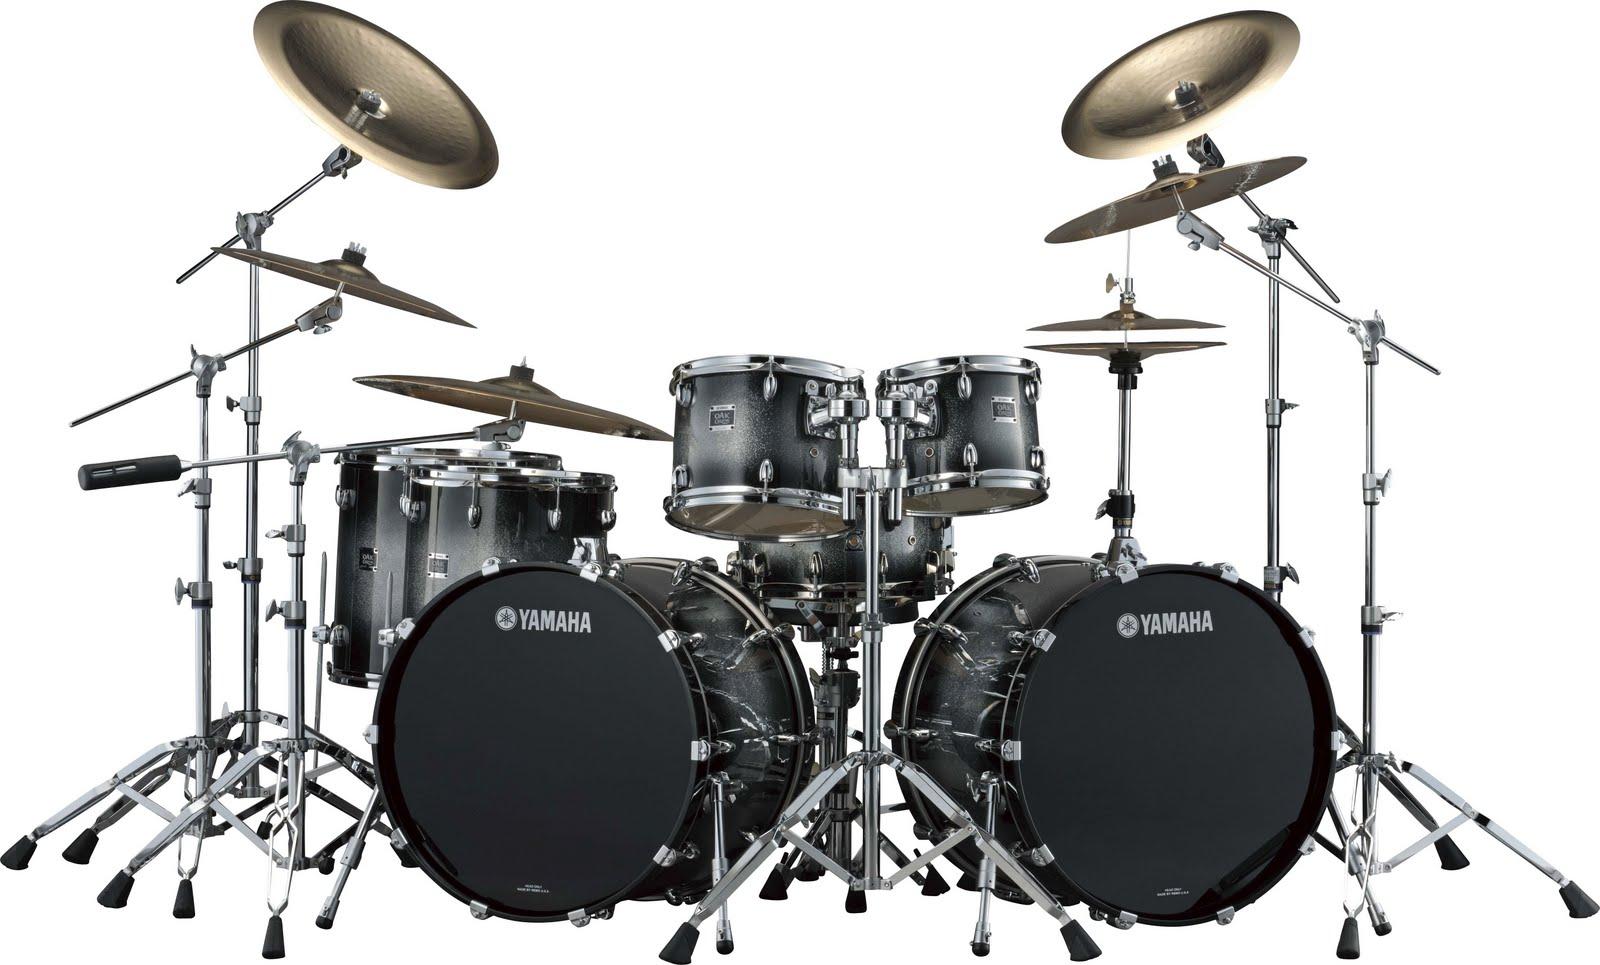 yamaha oak custom series drum set find your drum set drum kits gear percussion. Black Bedroom Furniture Sets. Home Design Ideas